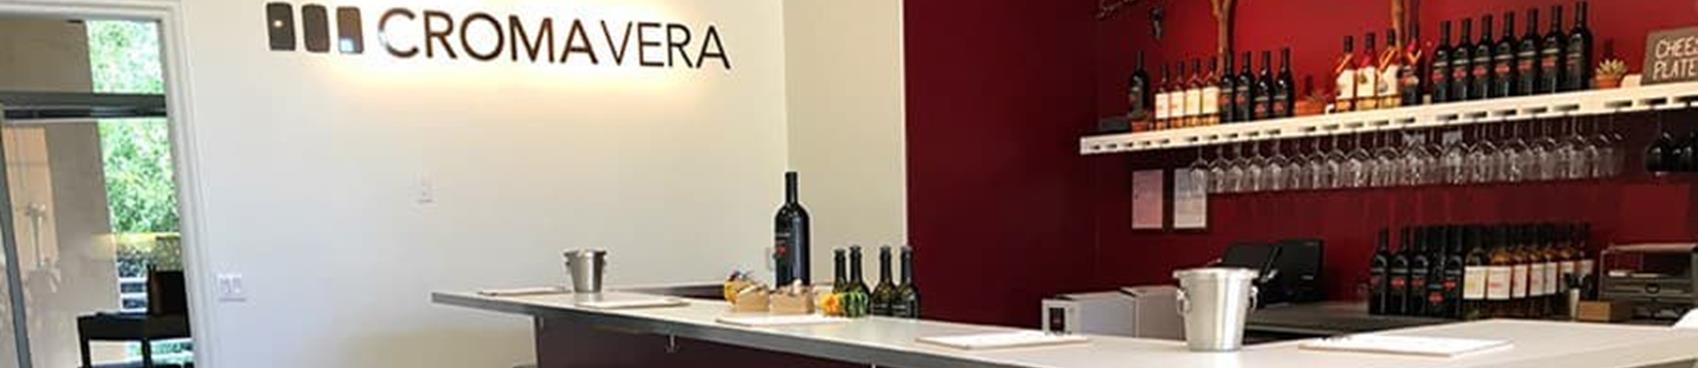 A image of Croma Vera Wines